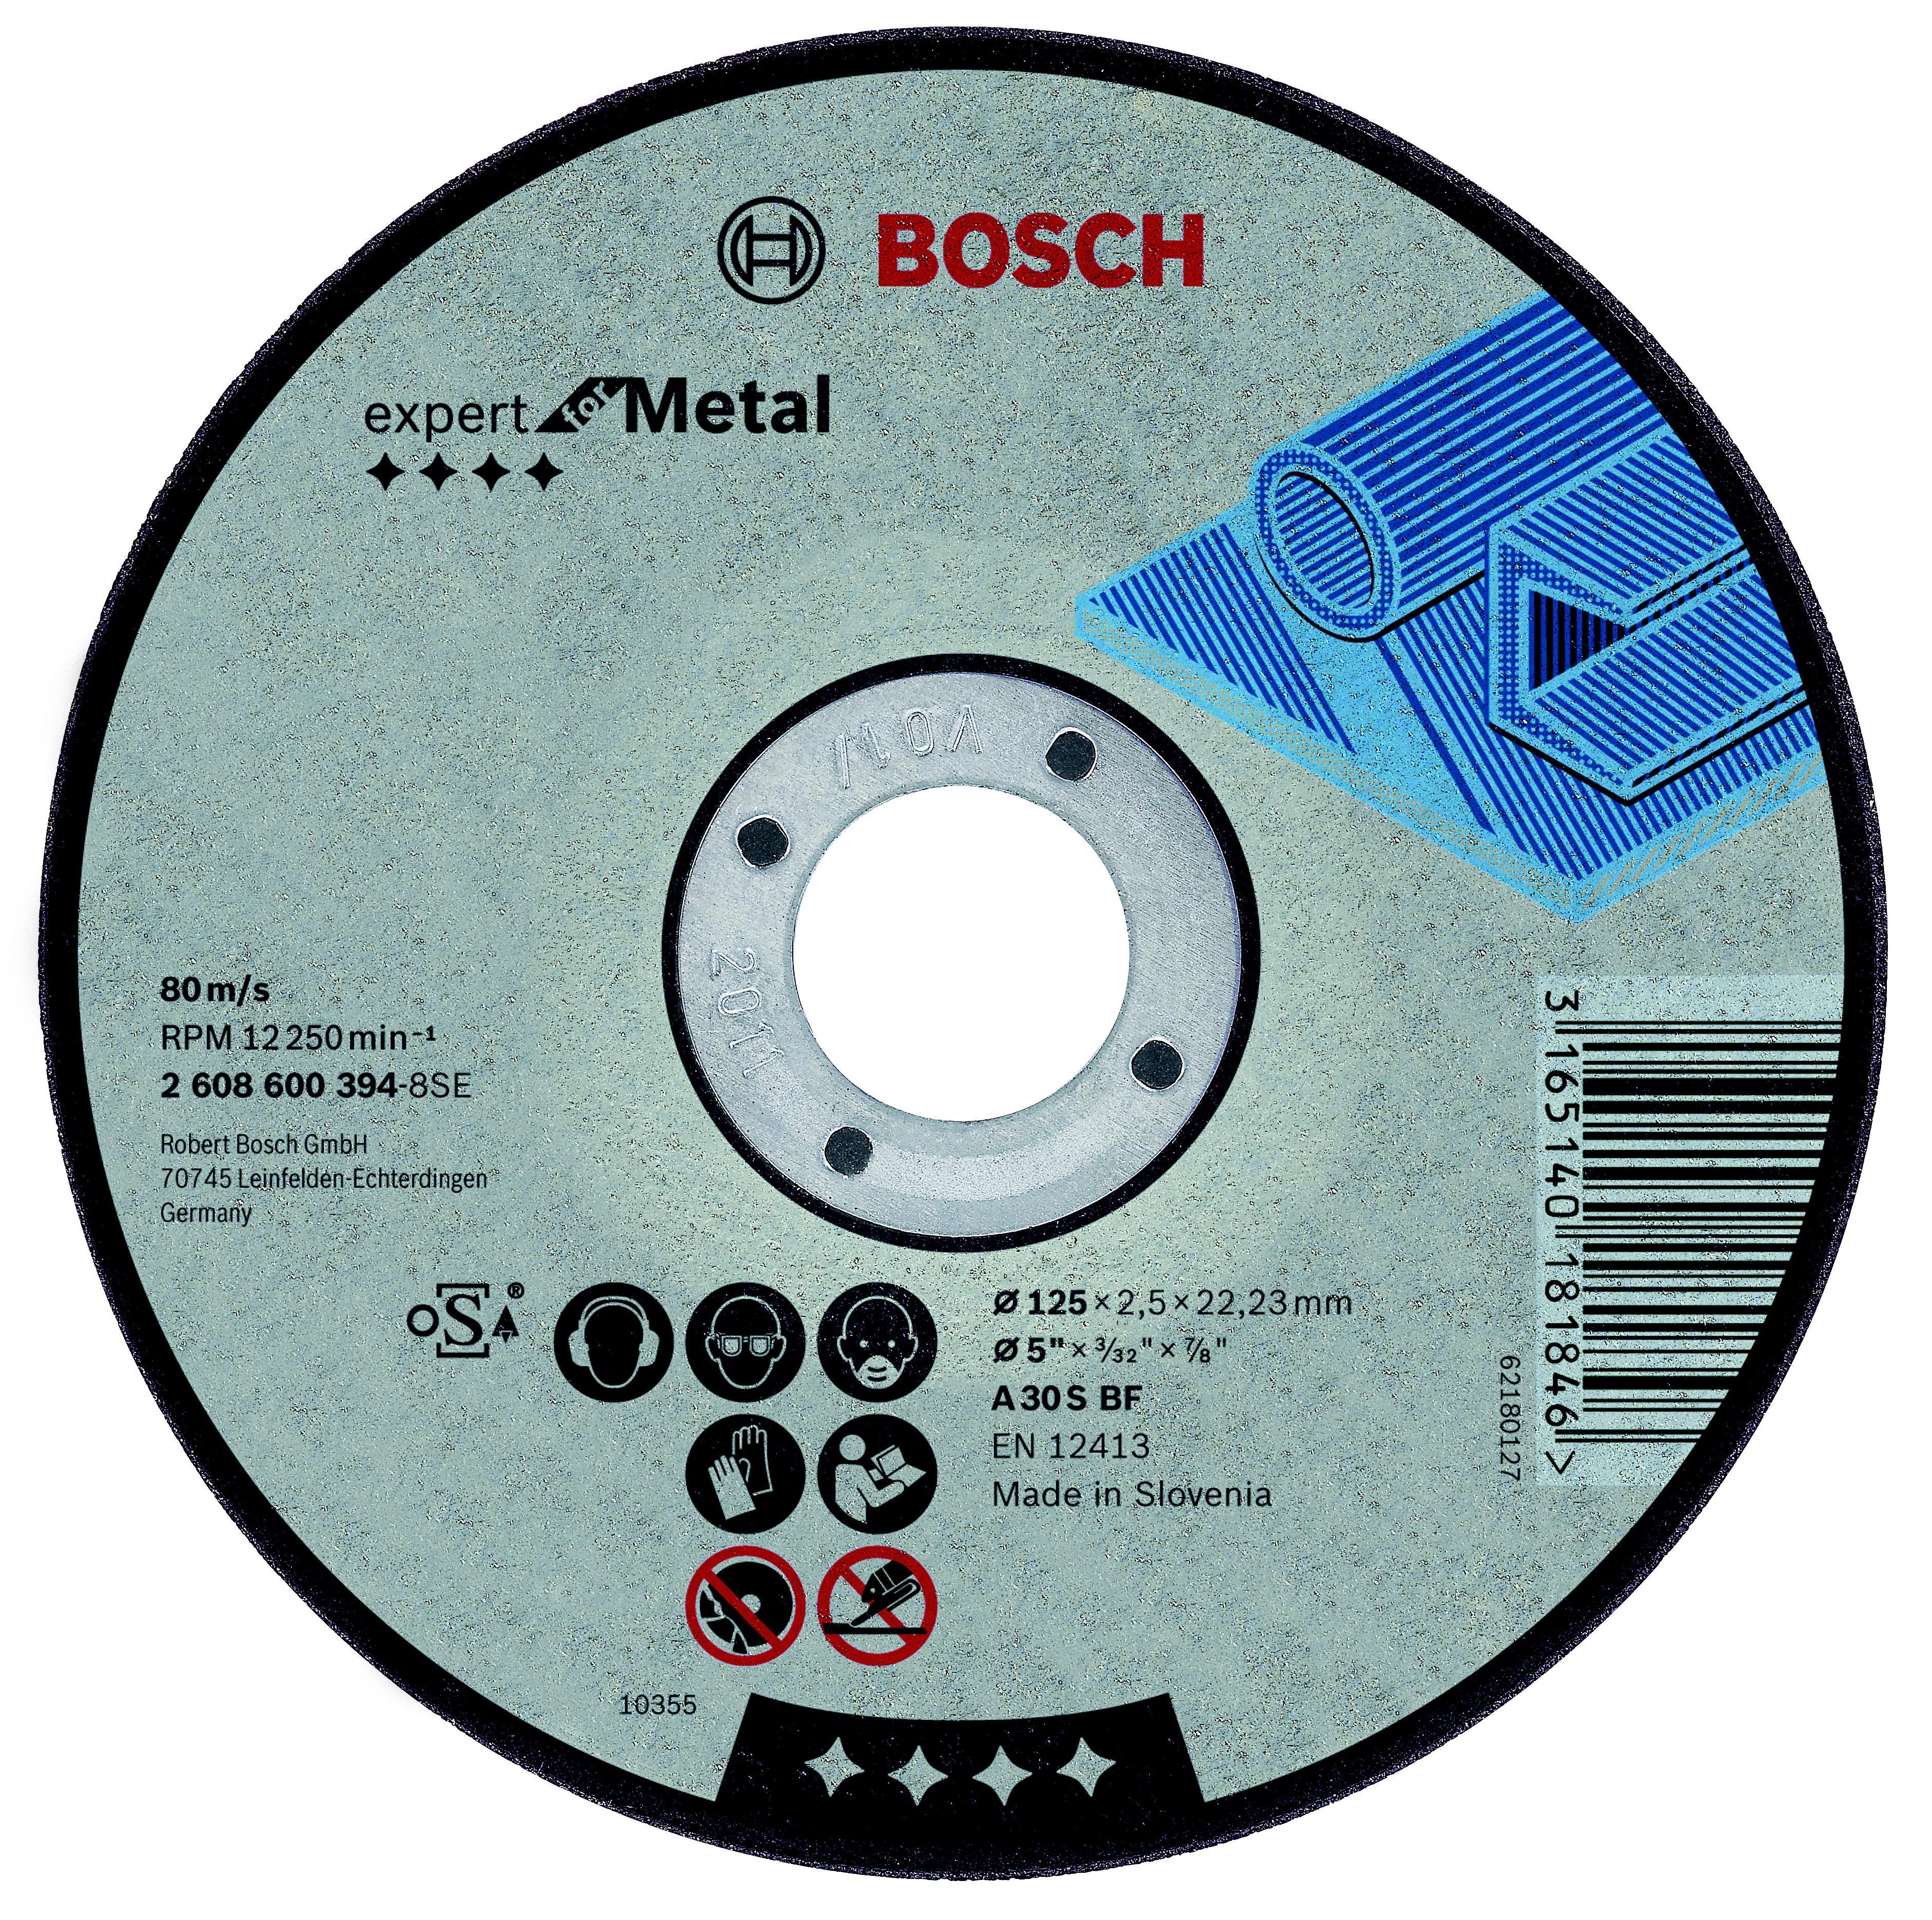 Круг отрезной Bosch 150х1.6х22 expert for metal (2.608.603.398) круг отрезной bosch expert for metal 230x1 9x22 2 608 603 400